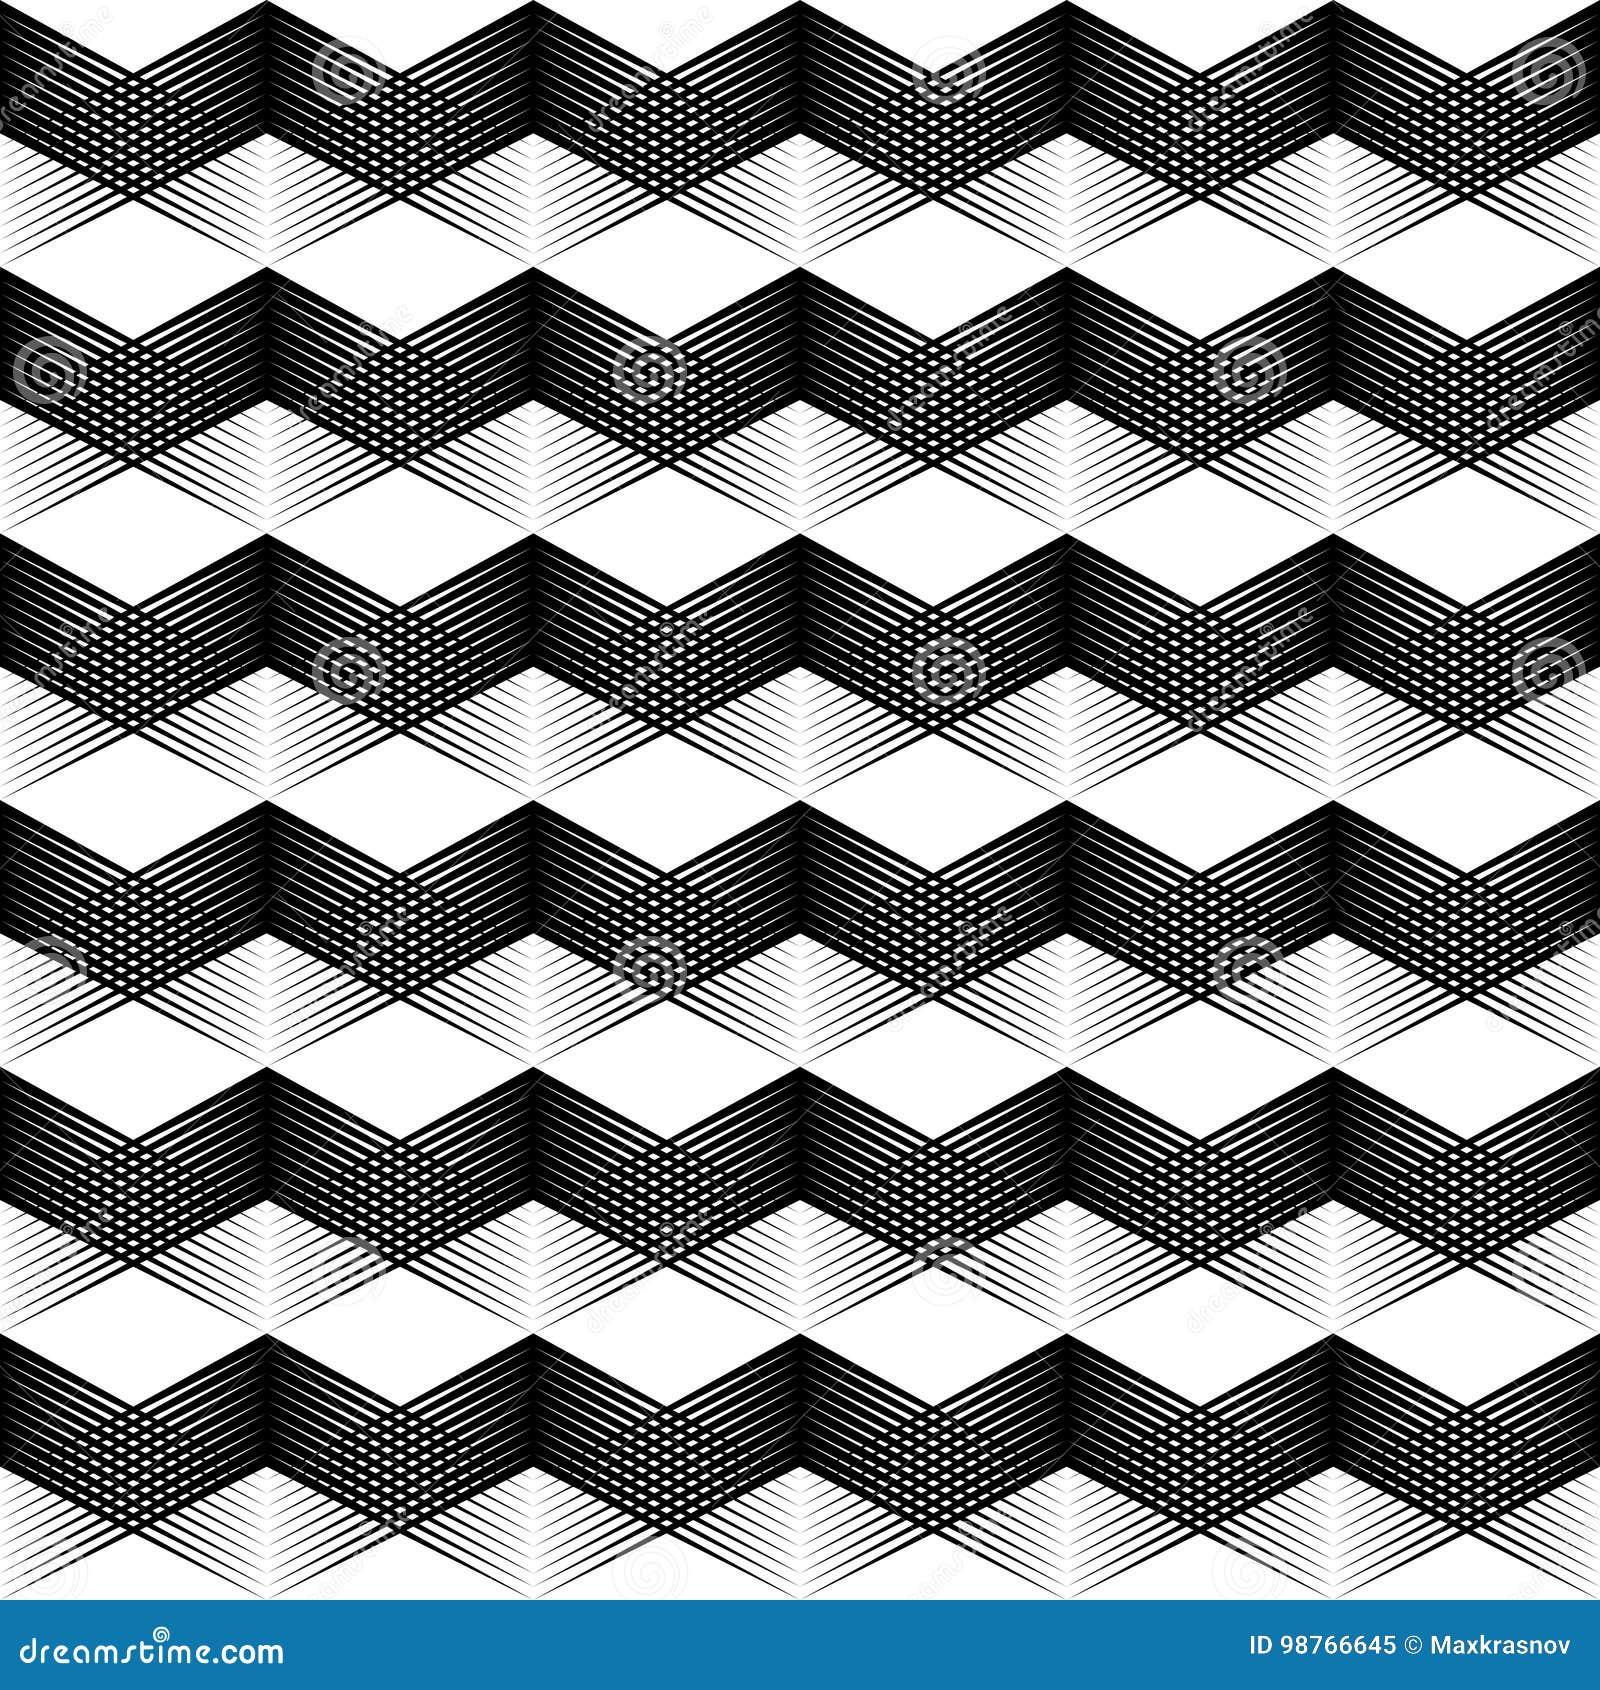 Abstract 3d Texture Seamless Cube Wallpaper Stock Vector